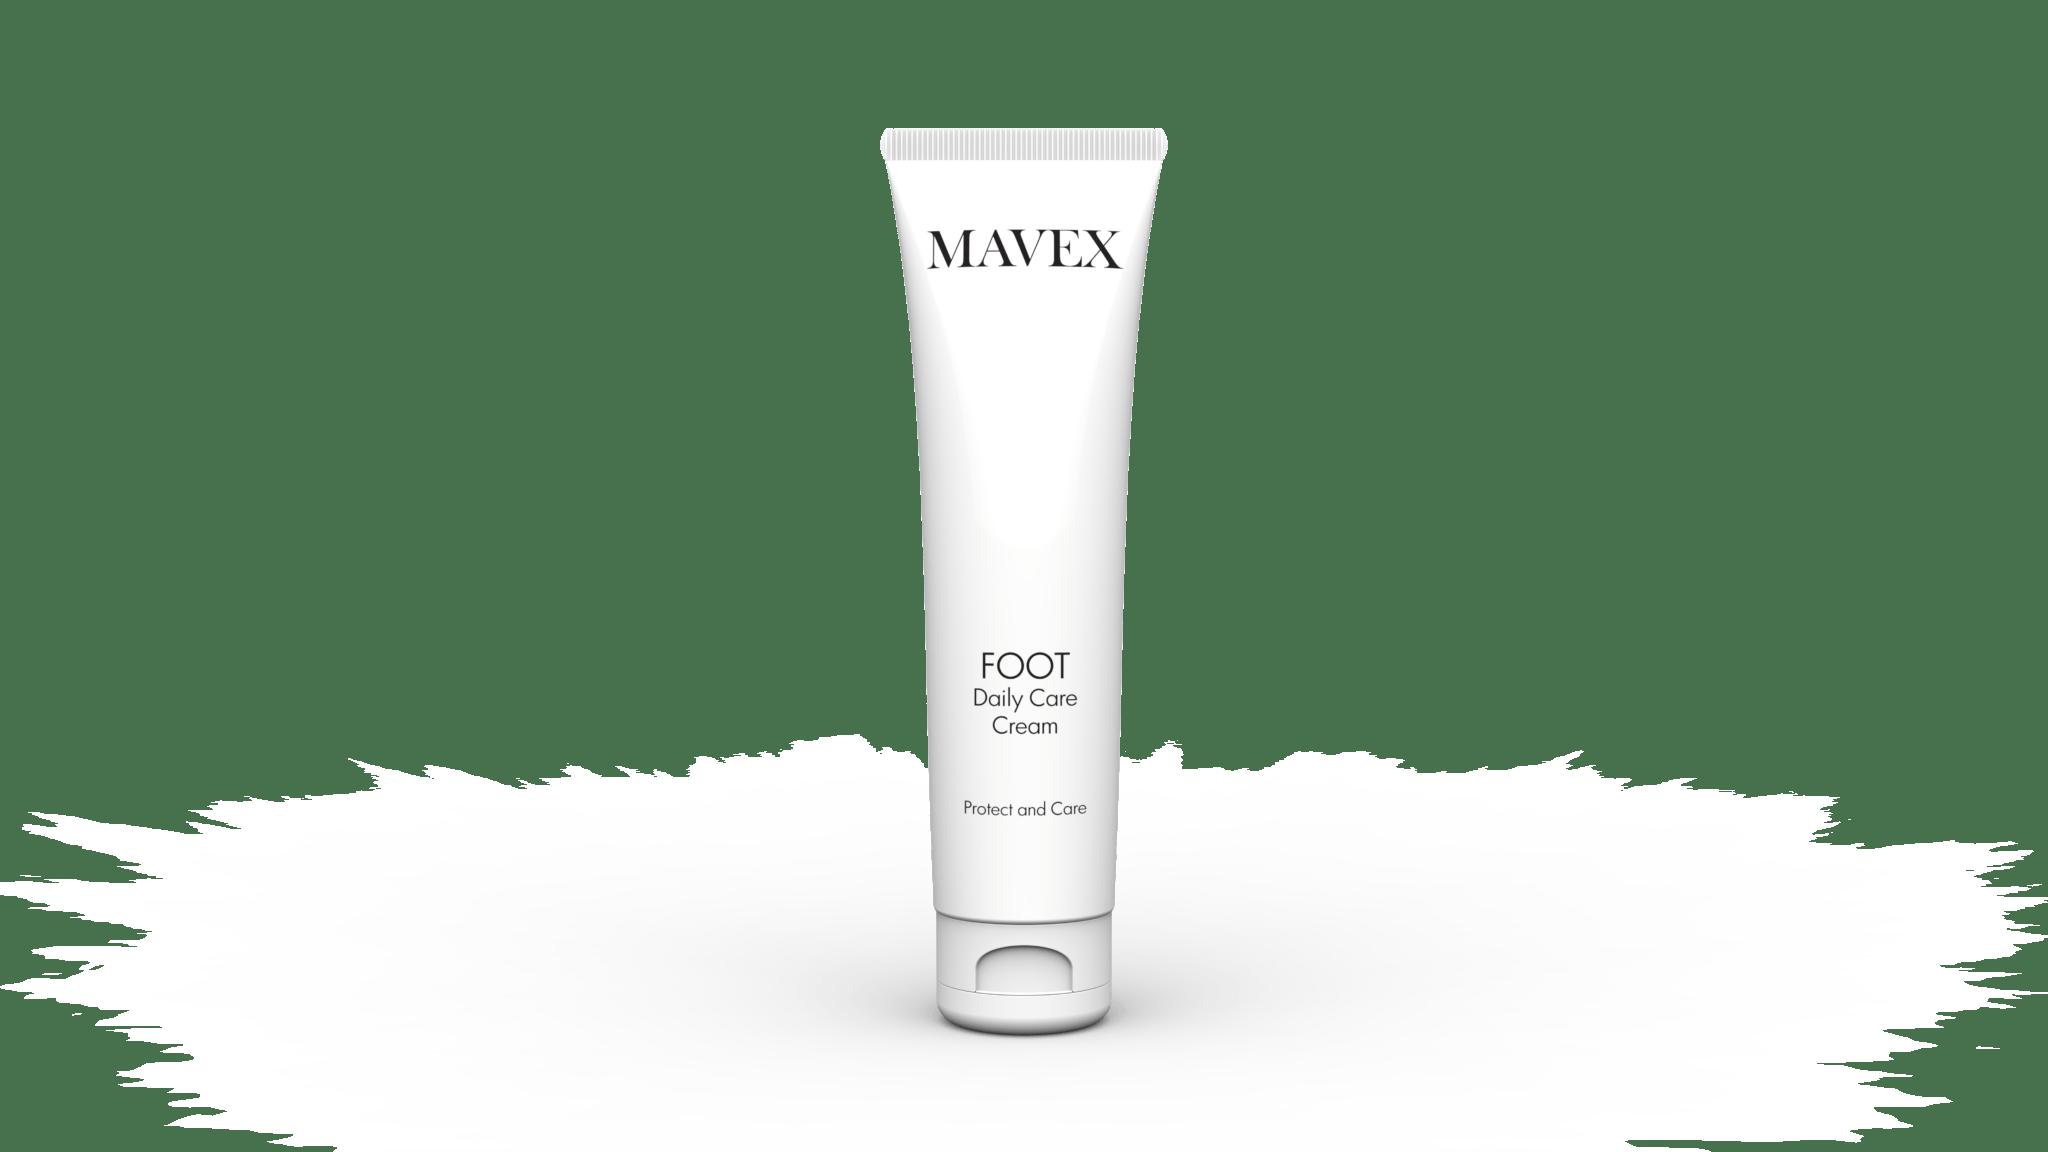 mavex Foot Daily Care Cream